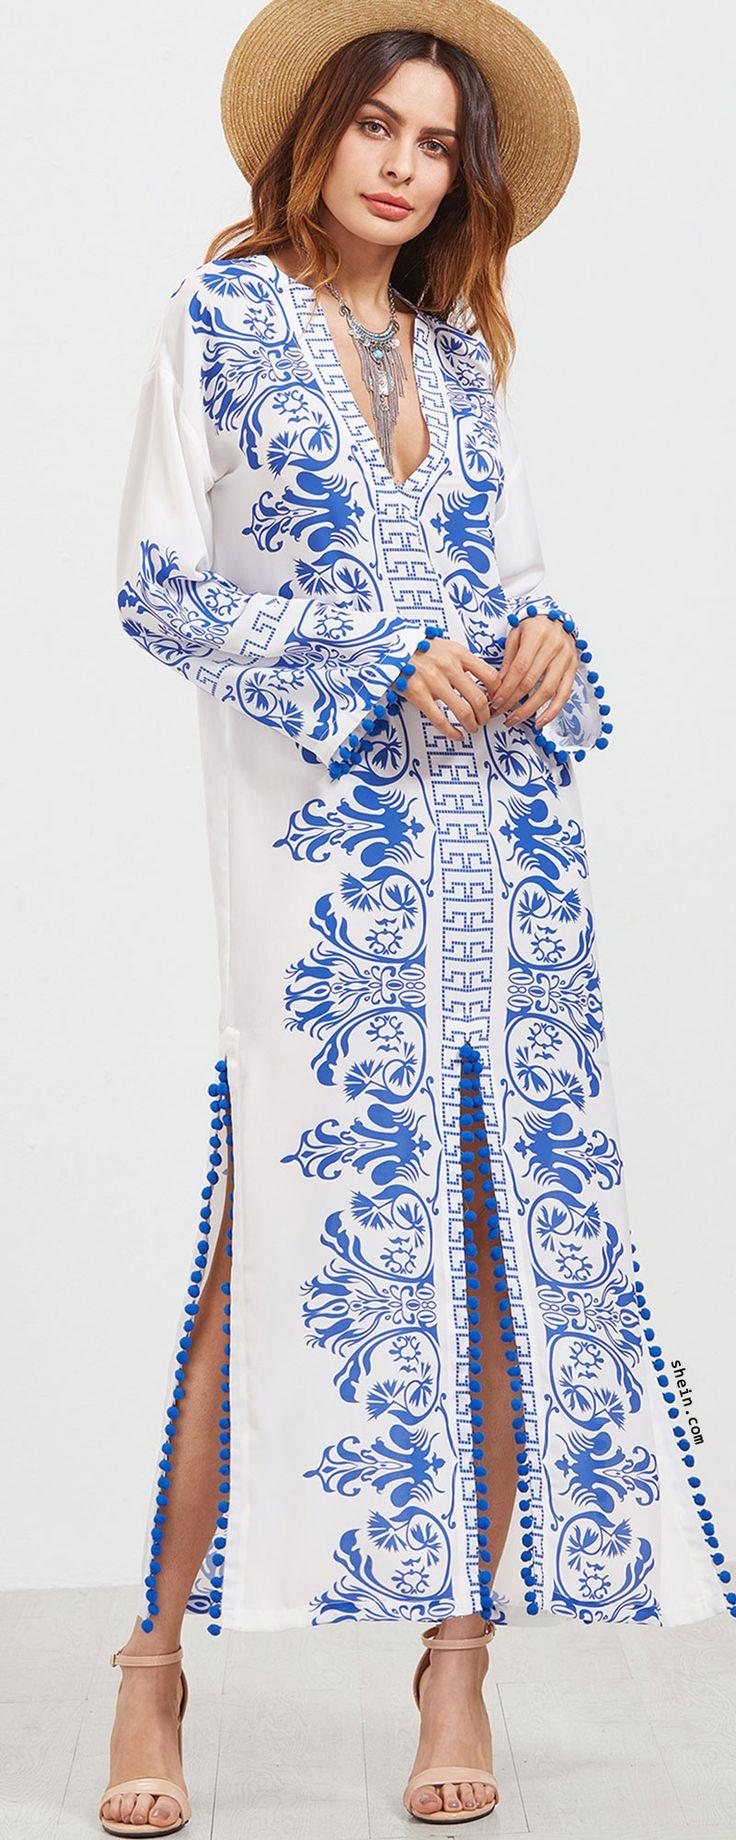 Blue Vintage Print Deep V Neck Pom Pom Trim Slit Dress